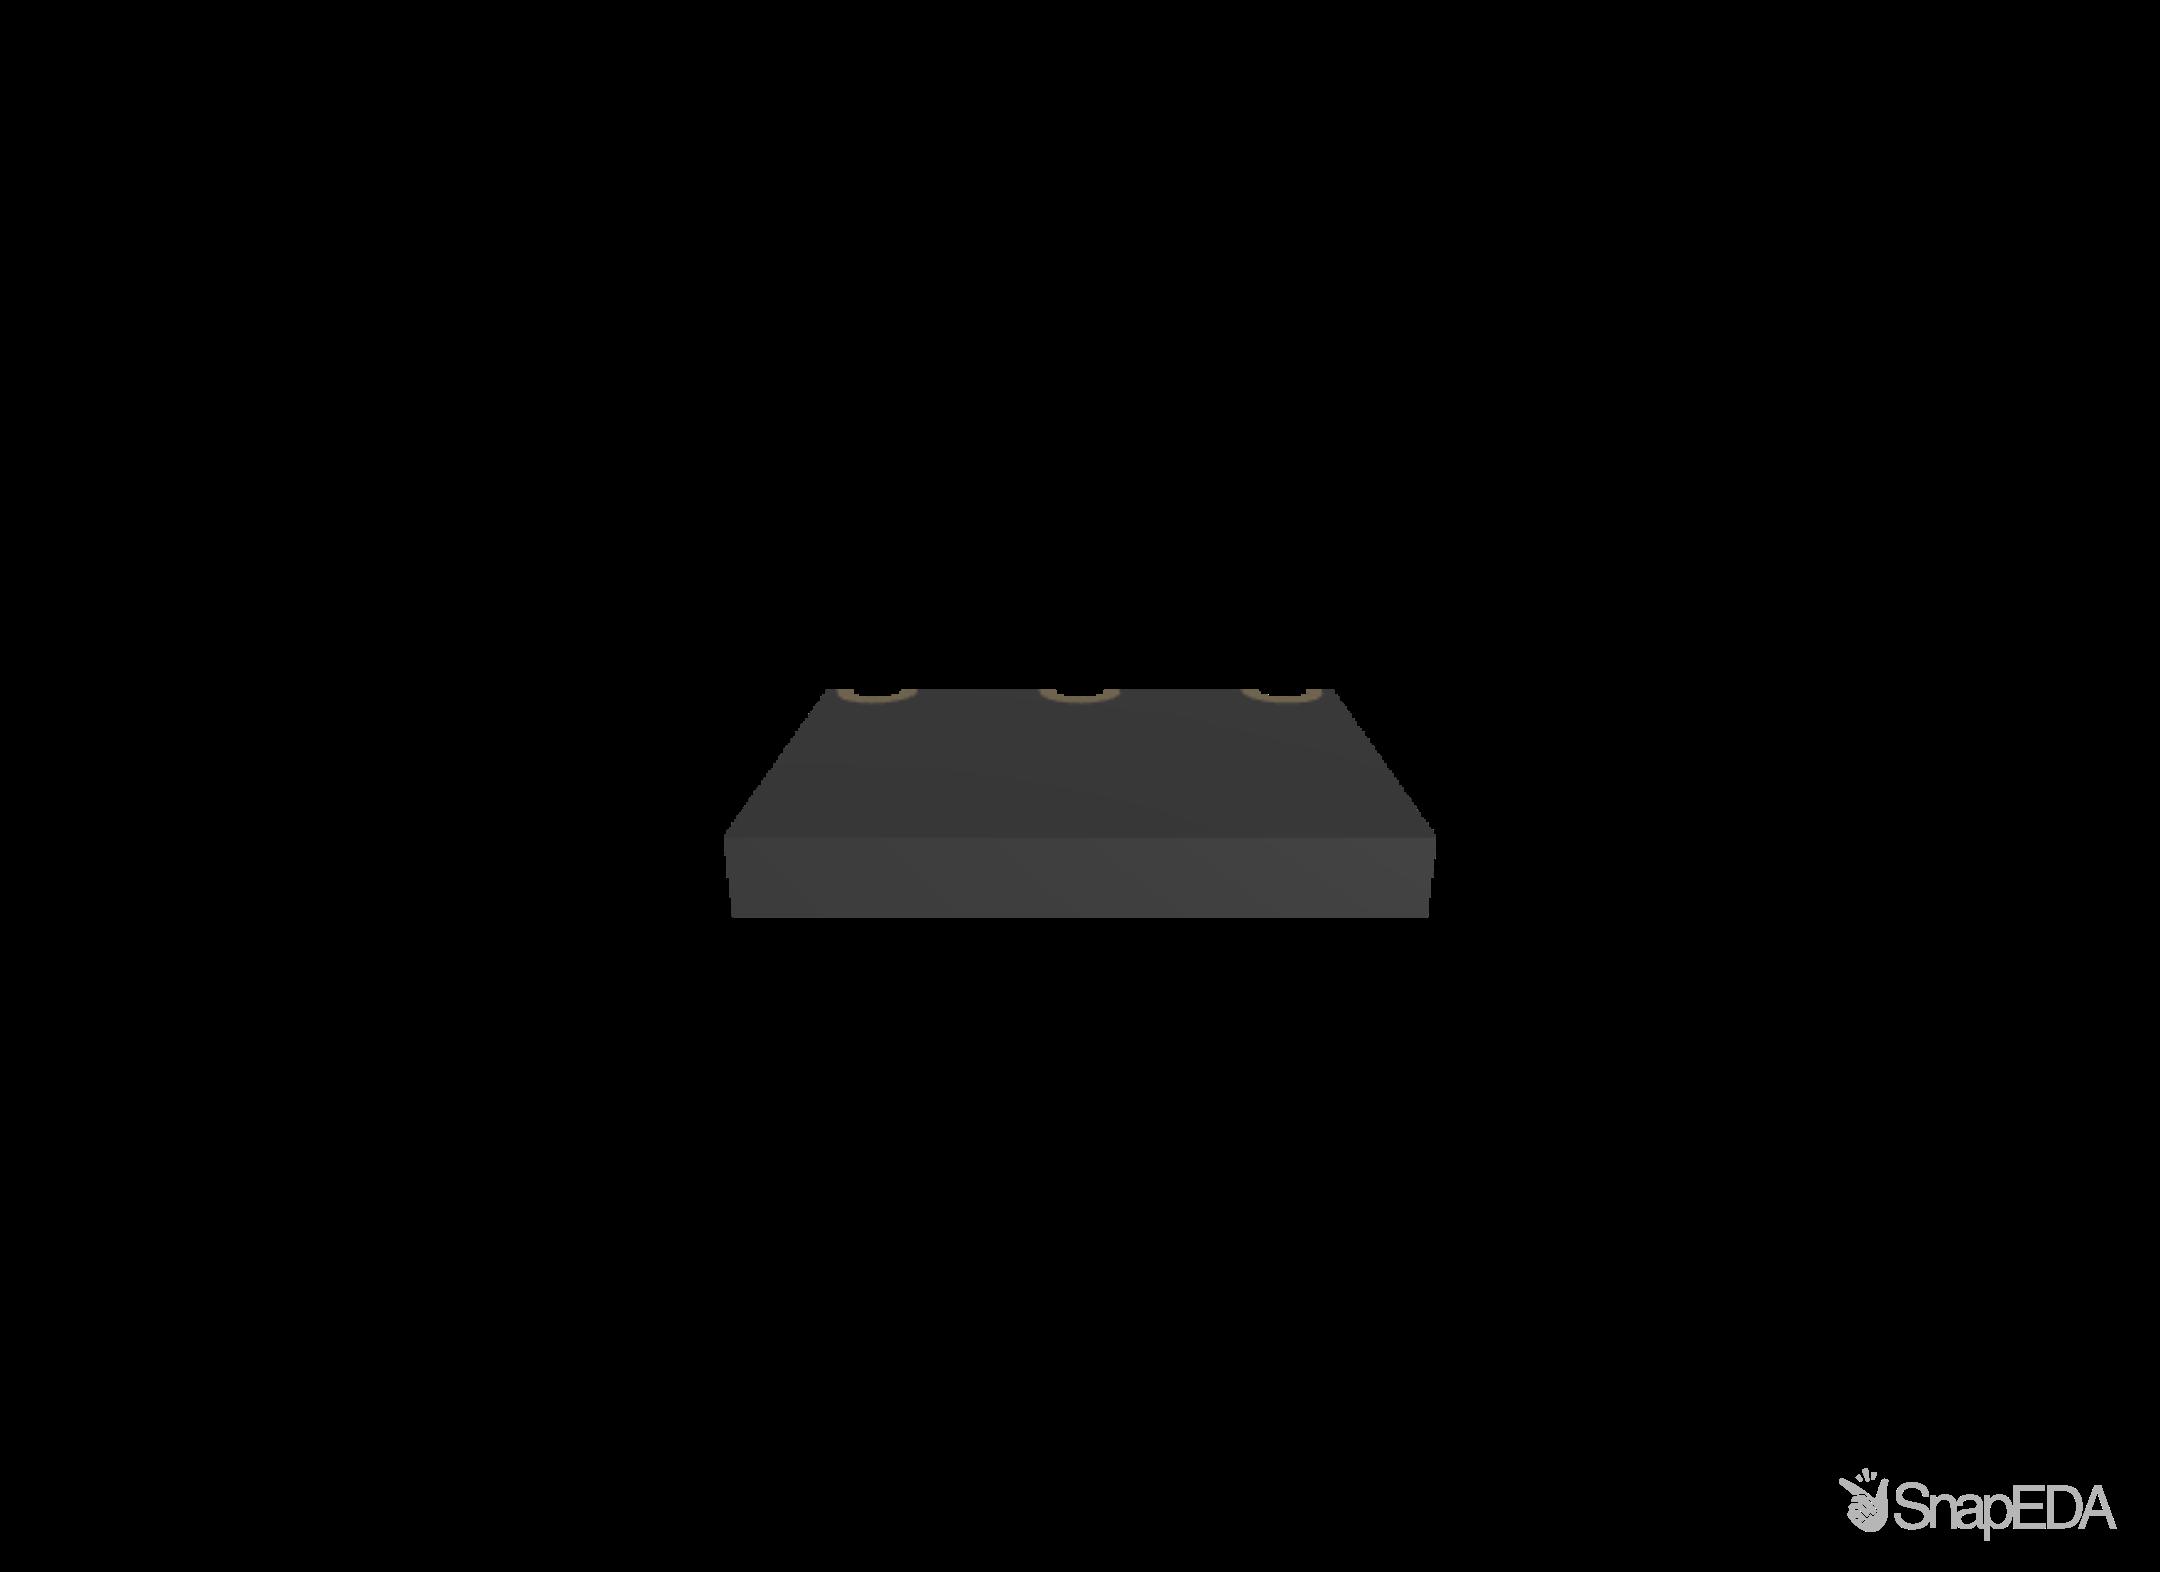 ANT-2.4-USP 3D Model